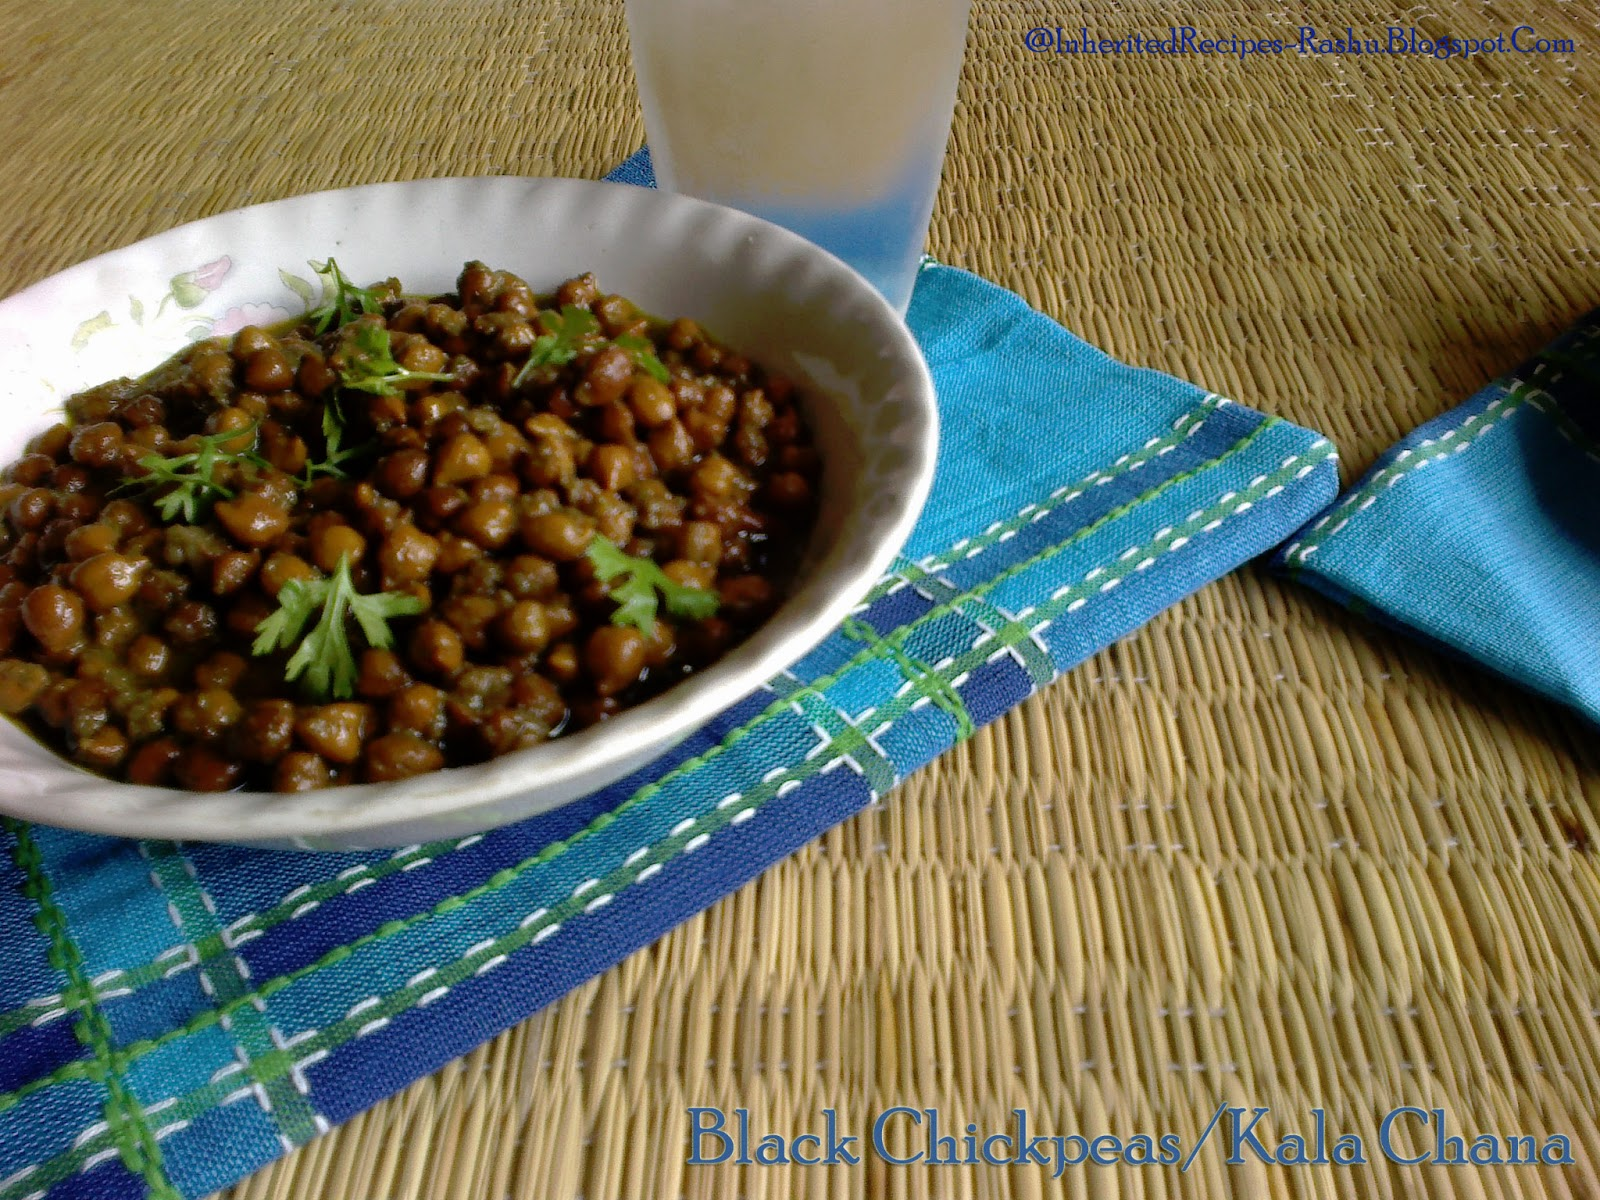 Inherited Recipes: Black Chickpeas/Bengal gram/Channa ...